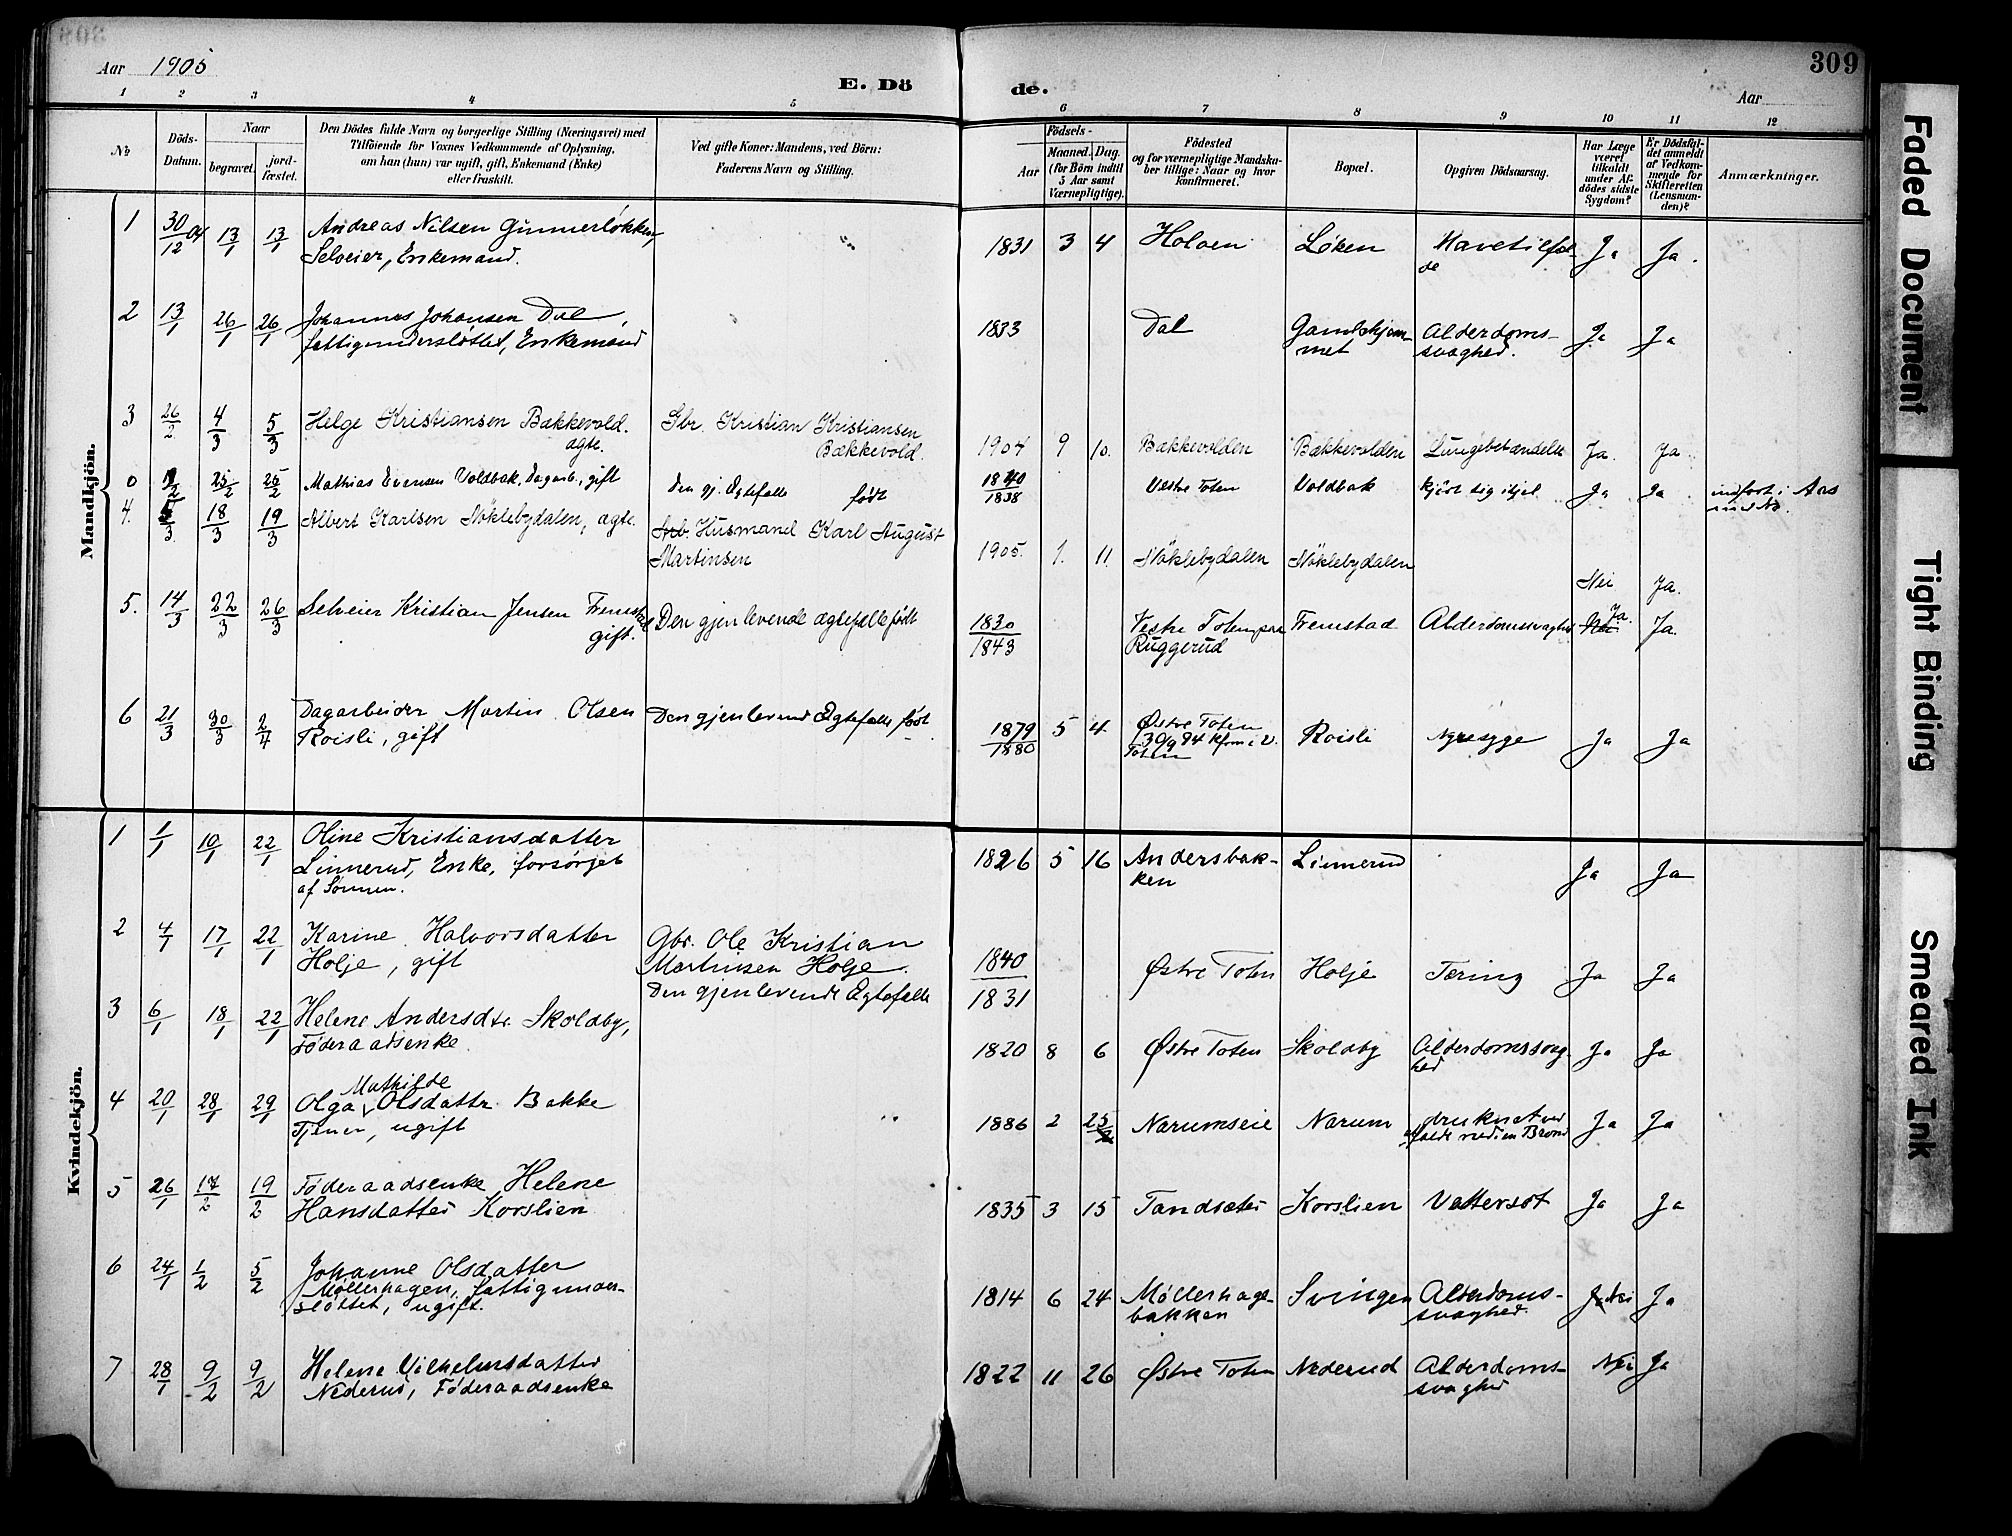 SAH, Vestre Toten prestekontor, H/Ha/Haa/L0013: Ministerialbok nr. 13, 1895-1911, s. 309